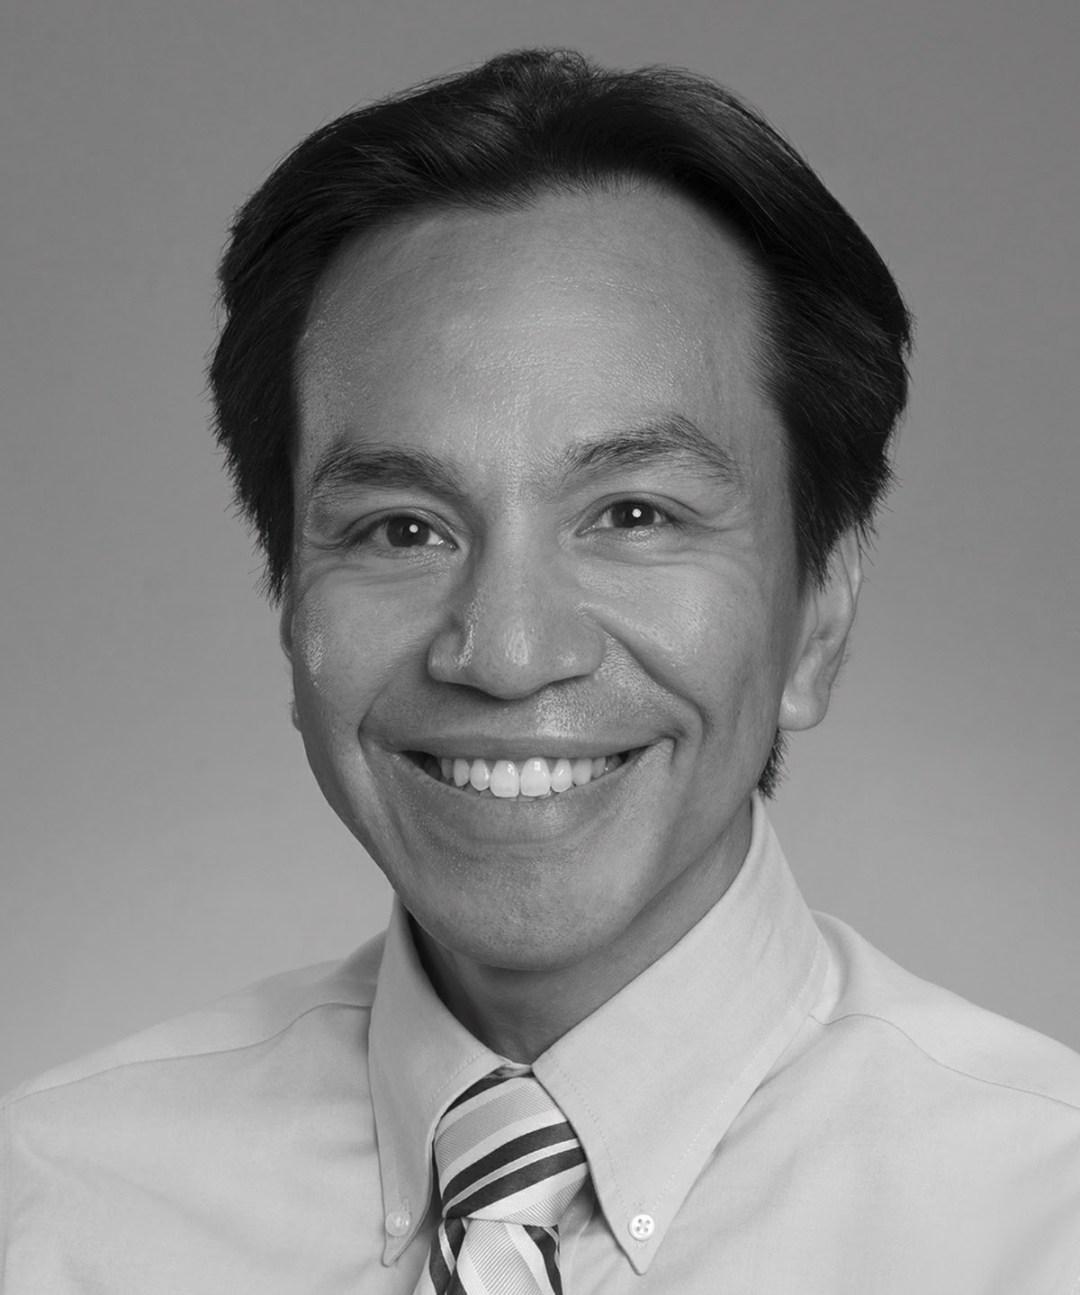 Noriel Lim